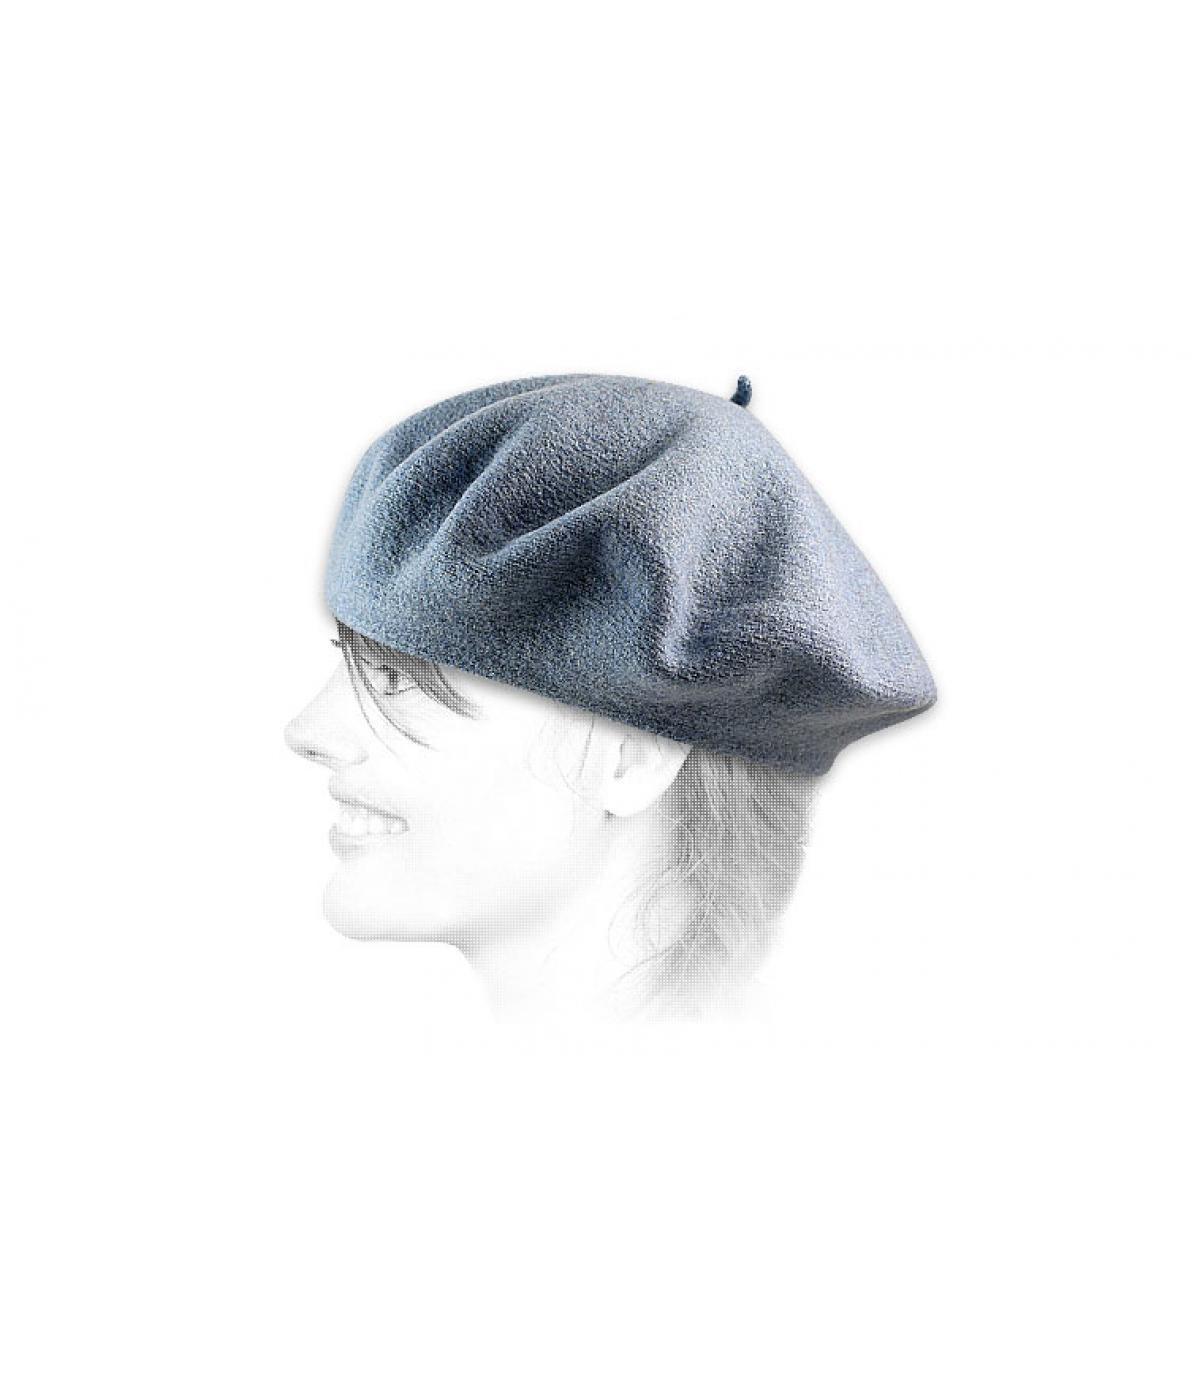 Béret laine femme bleu